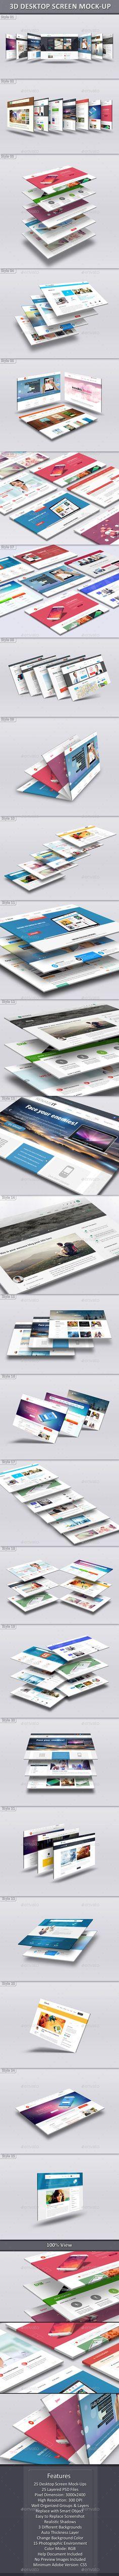 3D Desktop Screen Mock-Ups  -  PSD Template • Download ➝ https://graphicriver.net/item/3d-desktop-screen-mockups/12521745?ref=pxcr